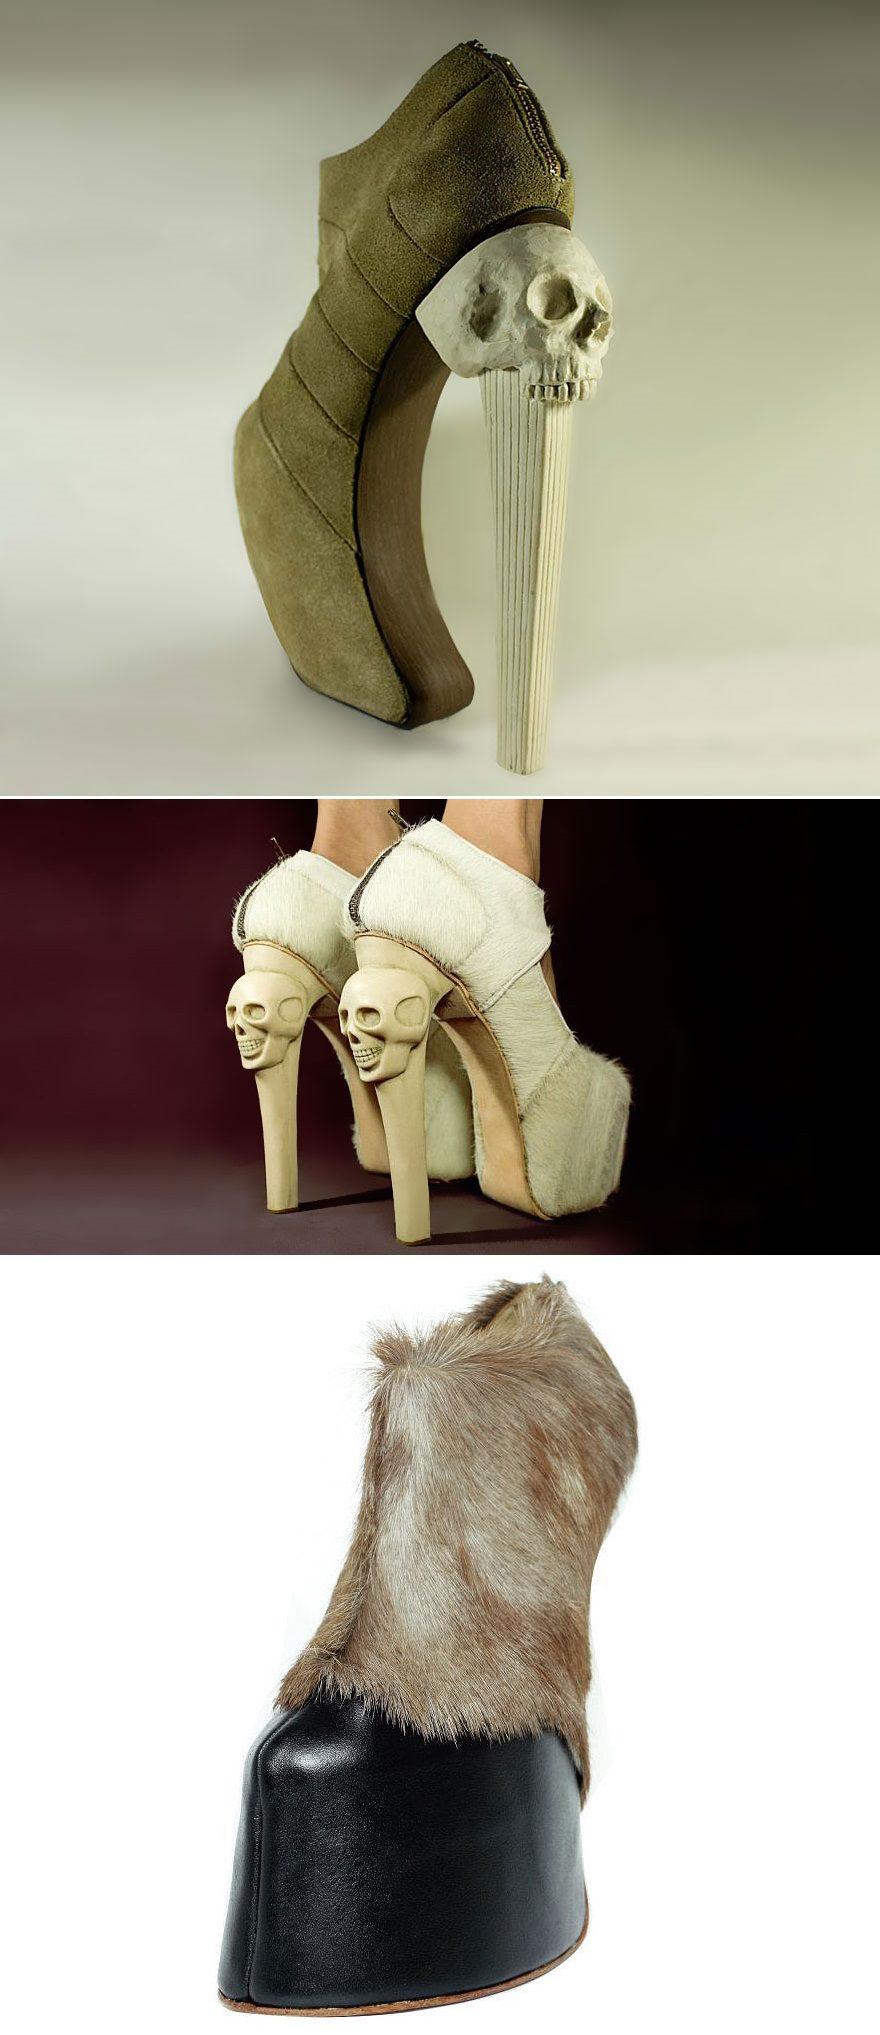 Crazy Shoes by Filipino Designer Kermit Tesoro 2